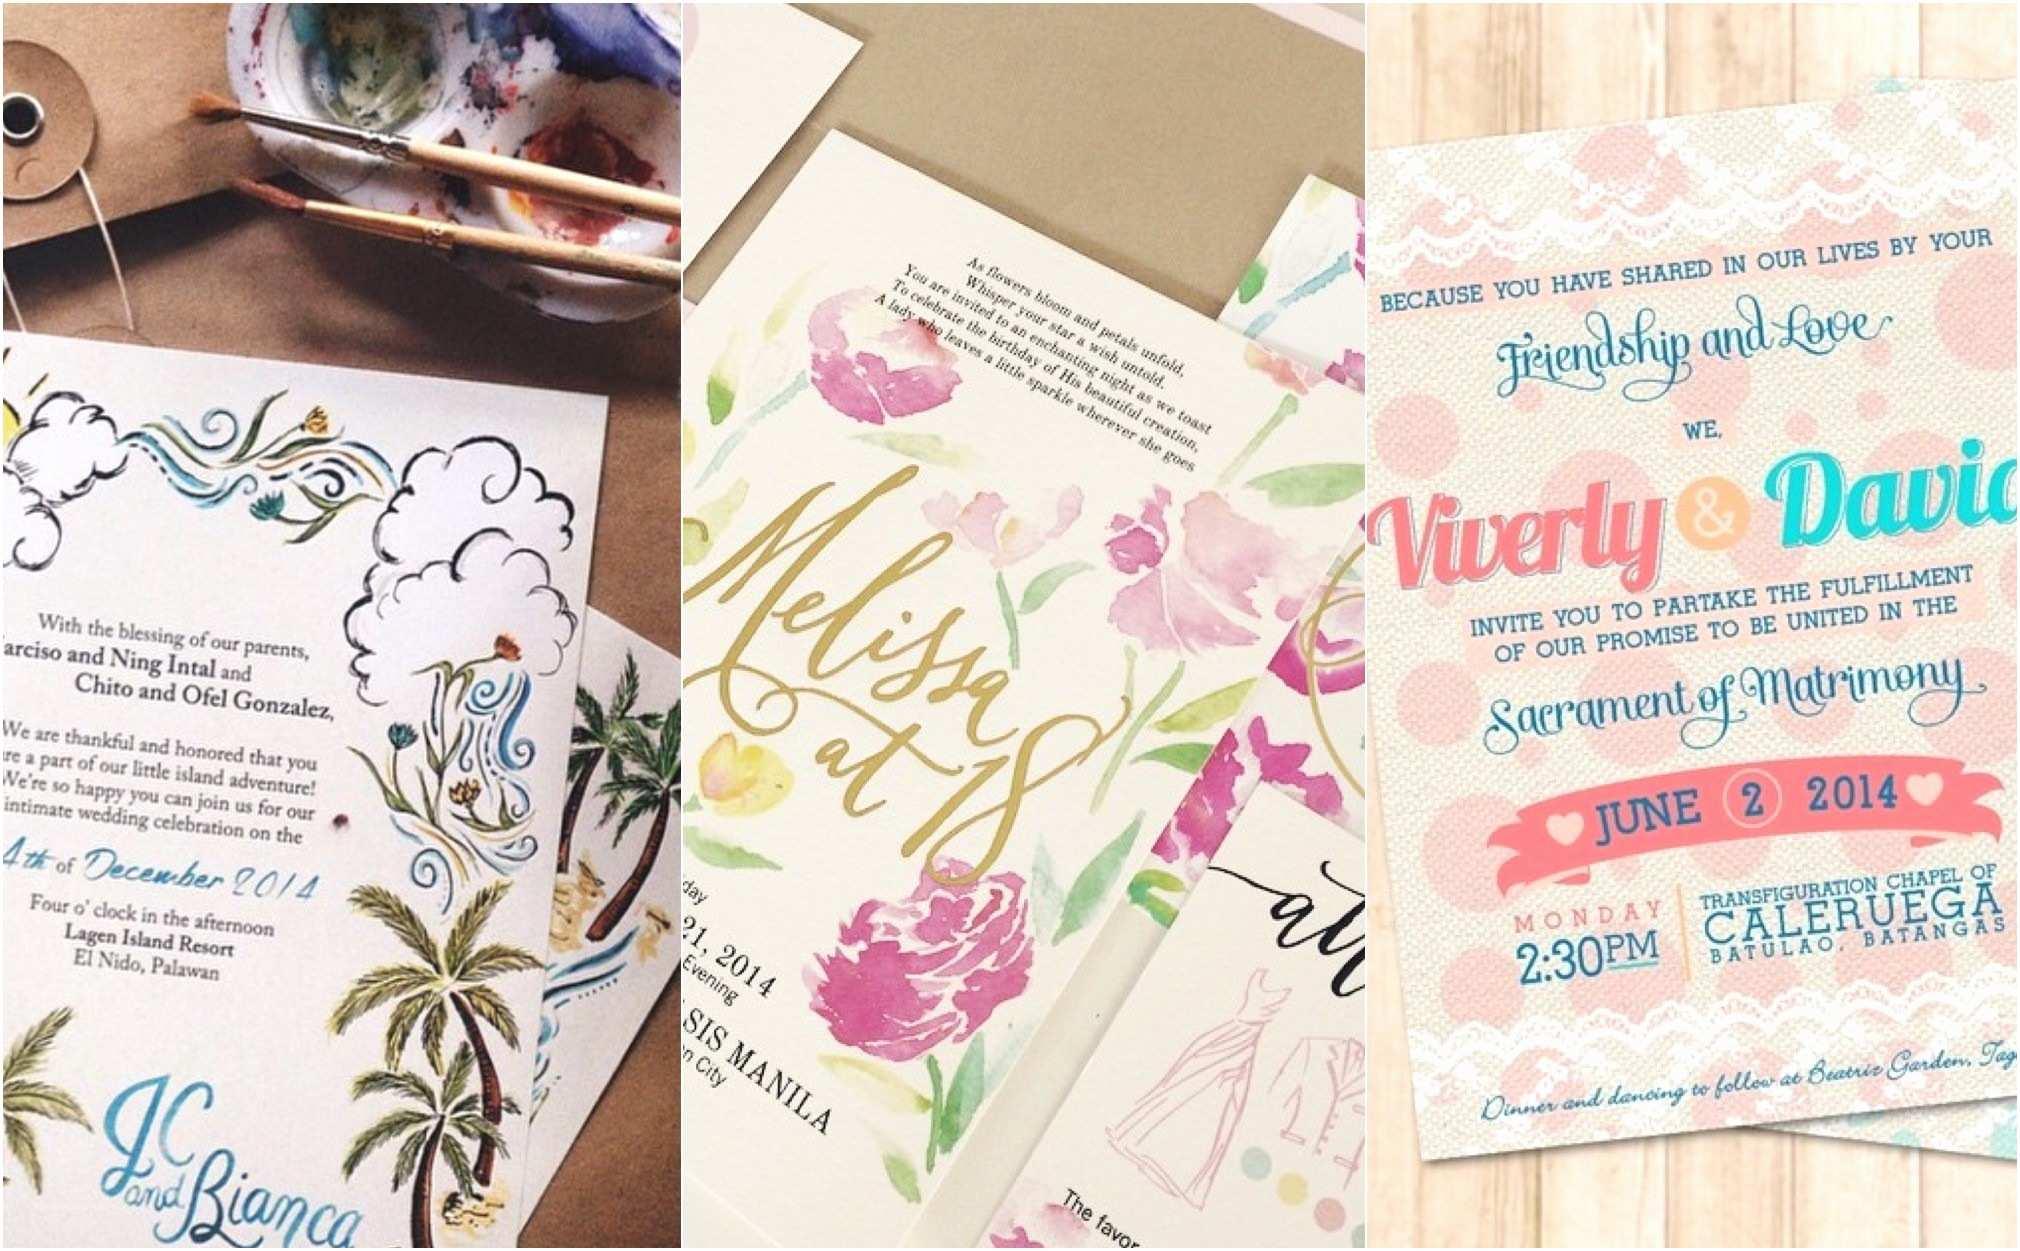 Wedding Invitation Cebu Invitation for Debut In Manila Save Marché Wedding